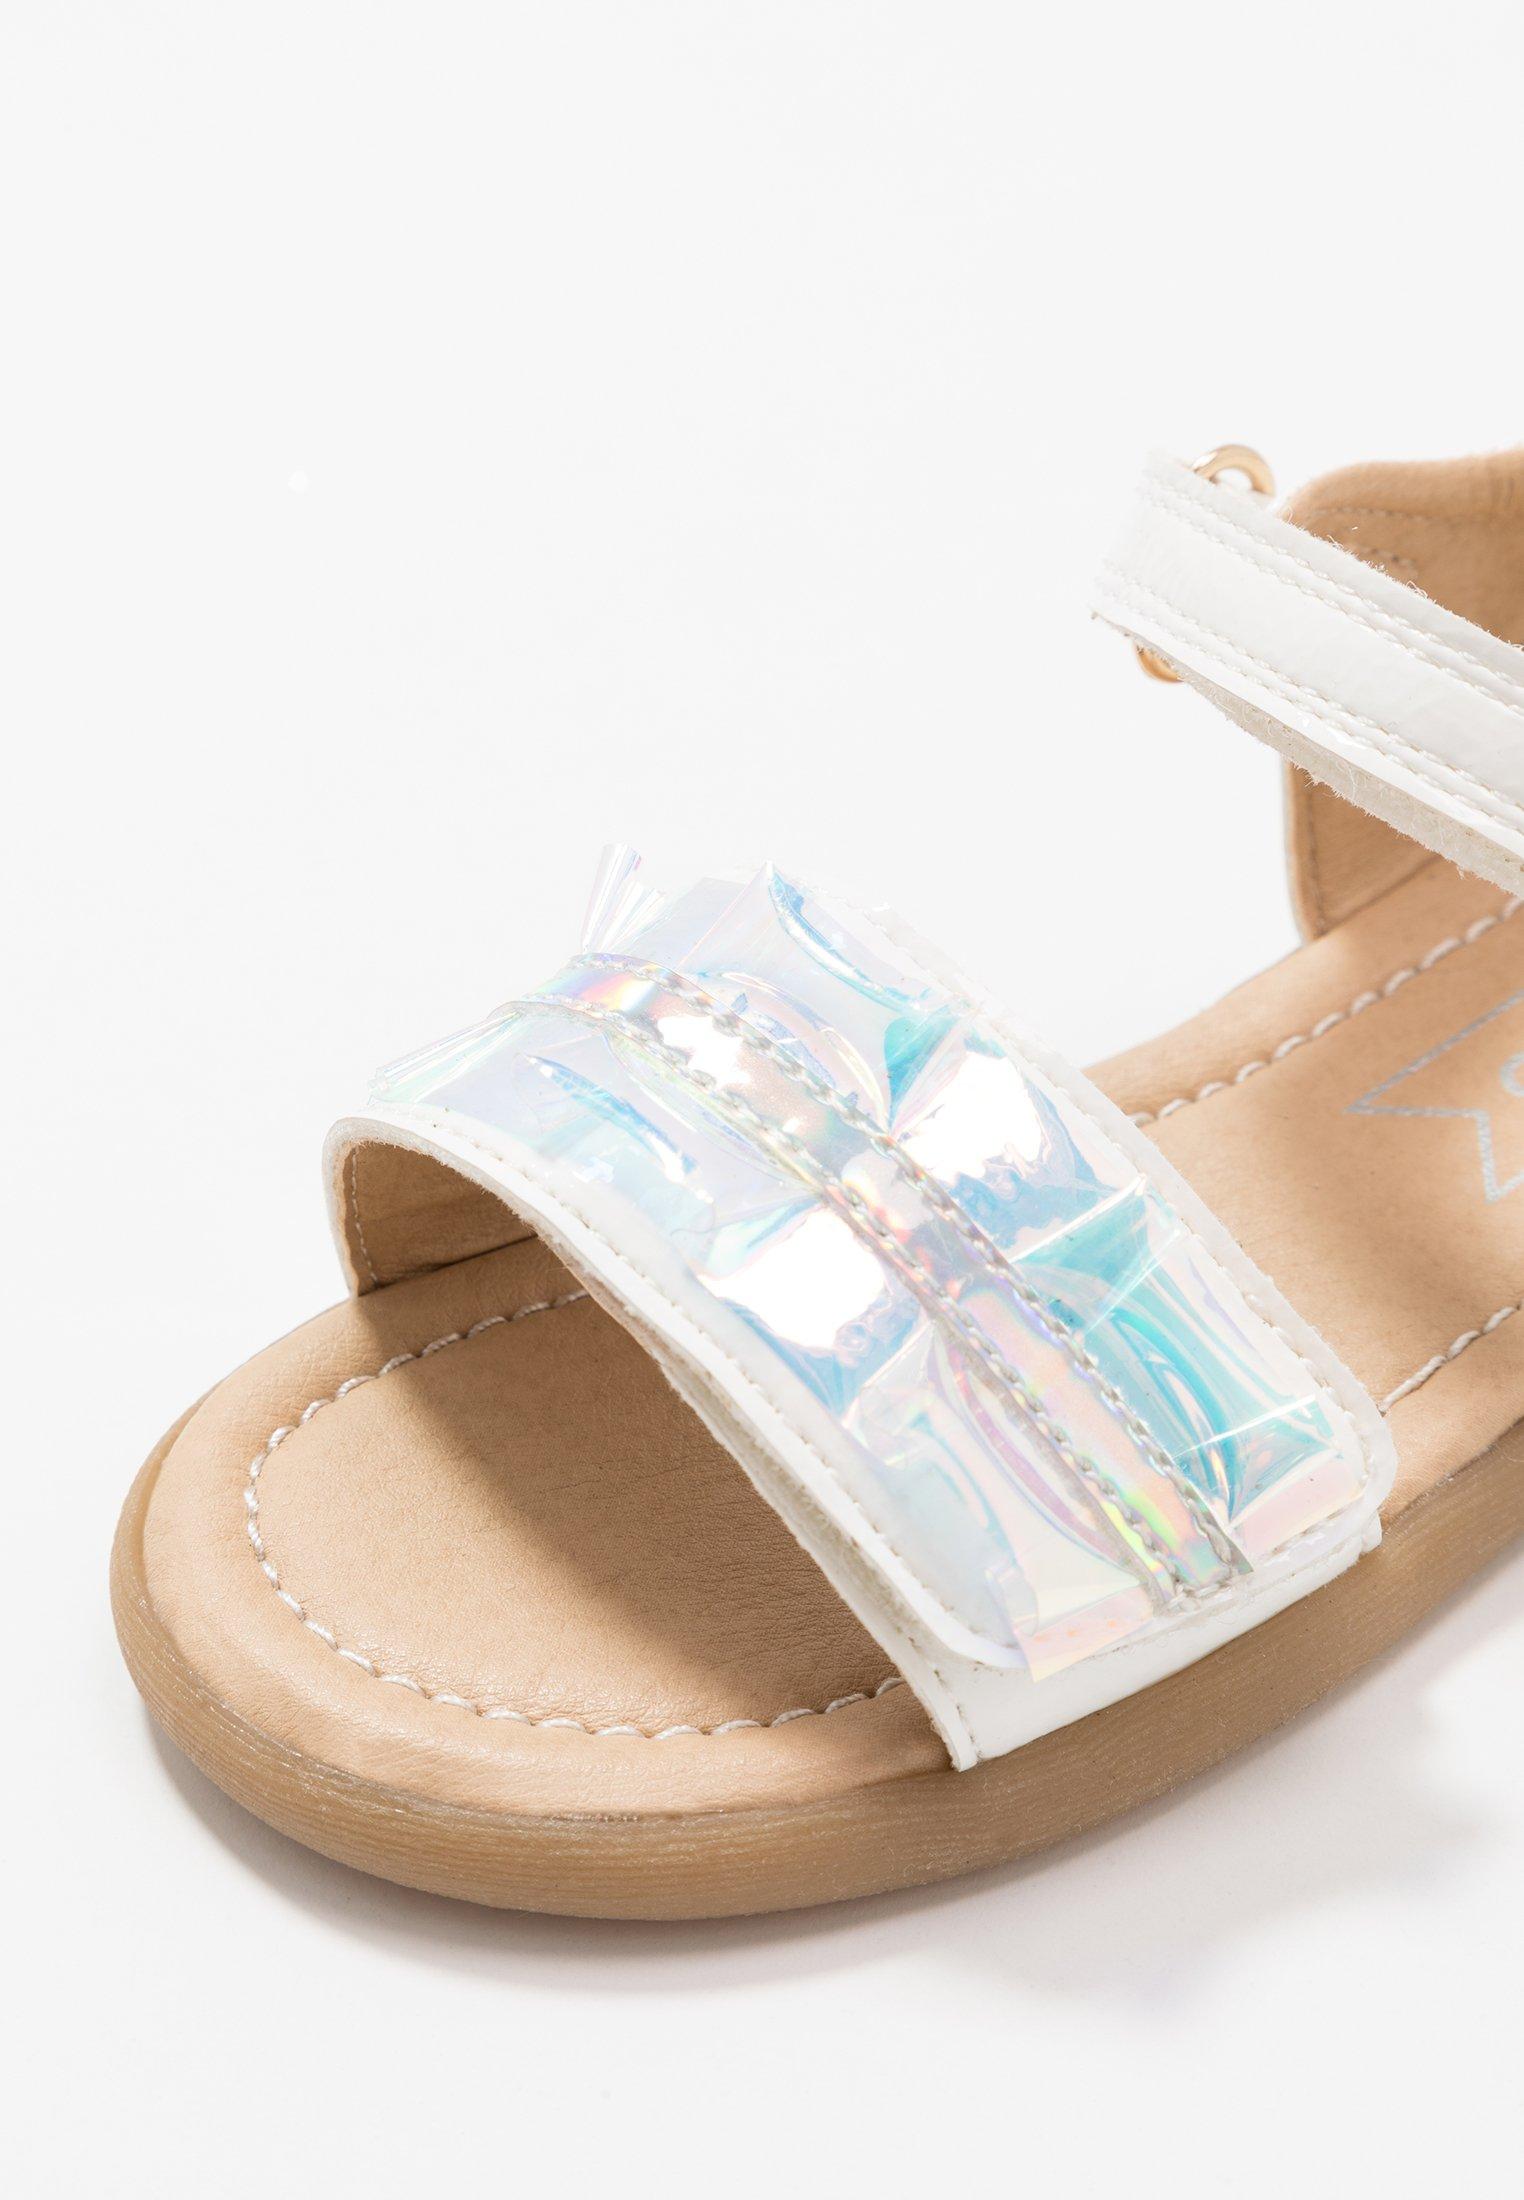 Gran descuento Friboo Sandalias - white | Zapatos para niños 2020 8LUuO